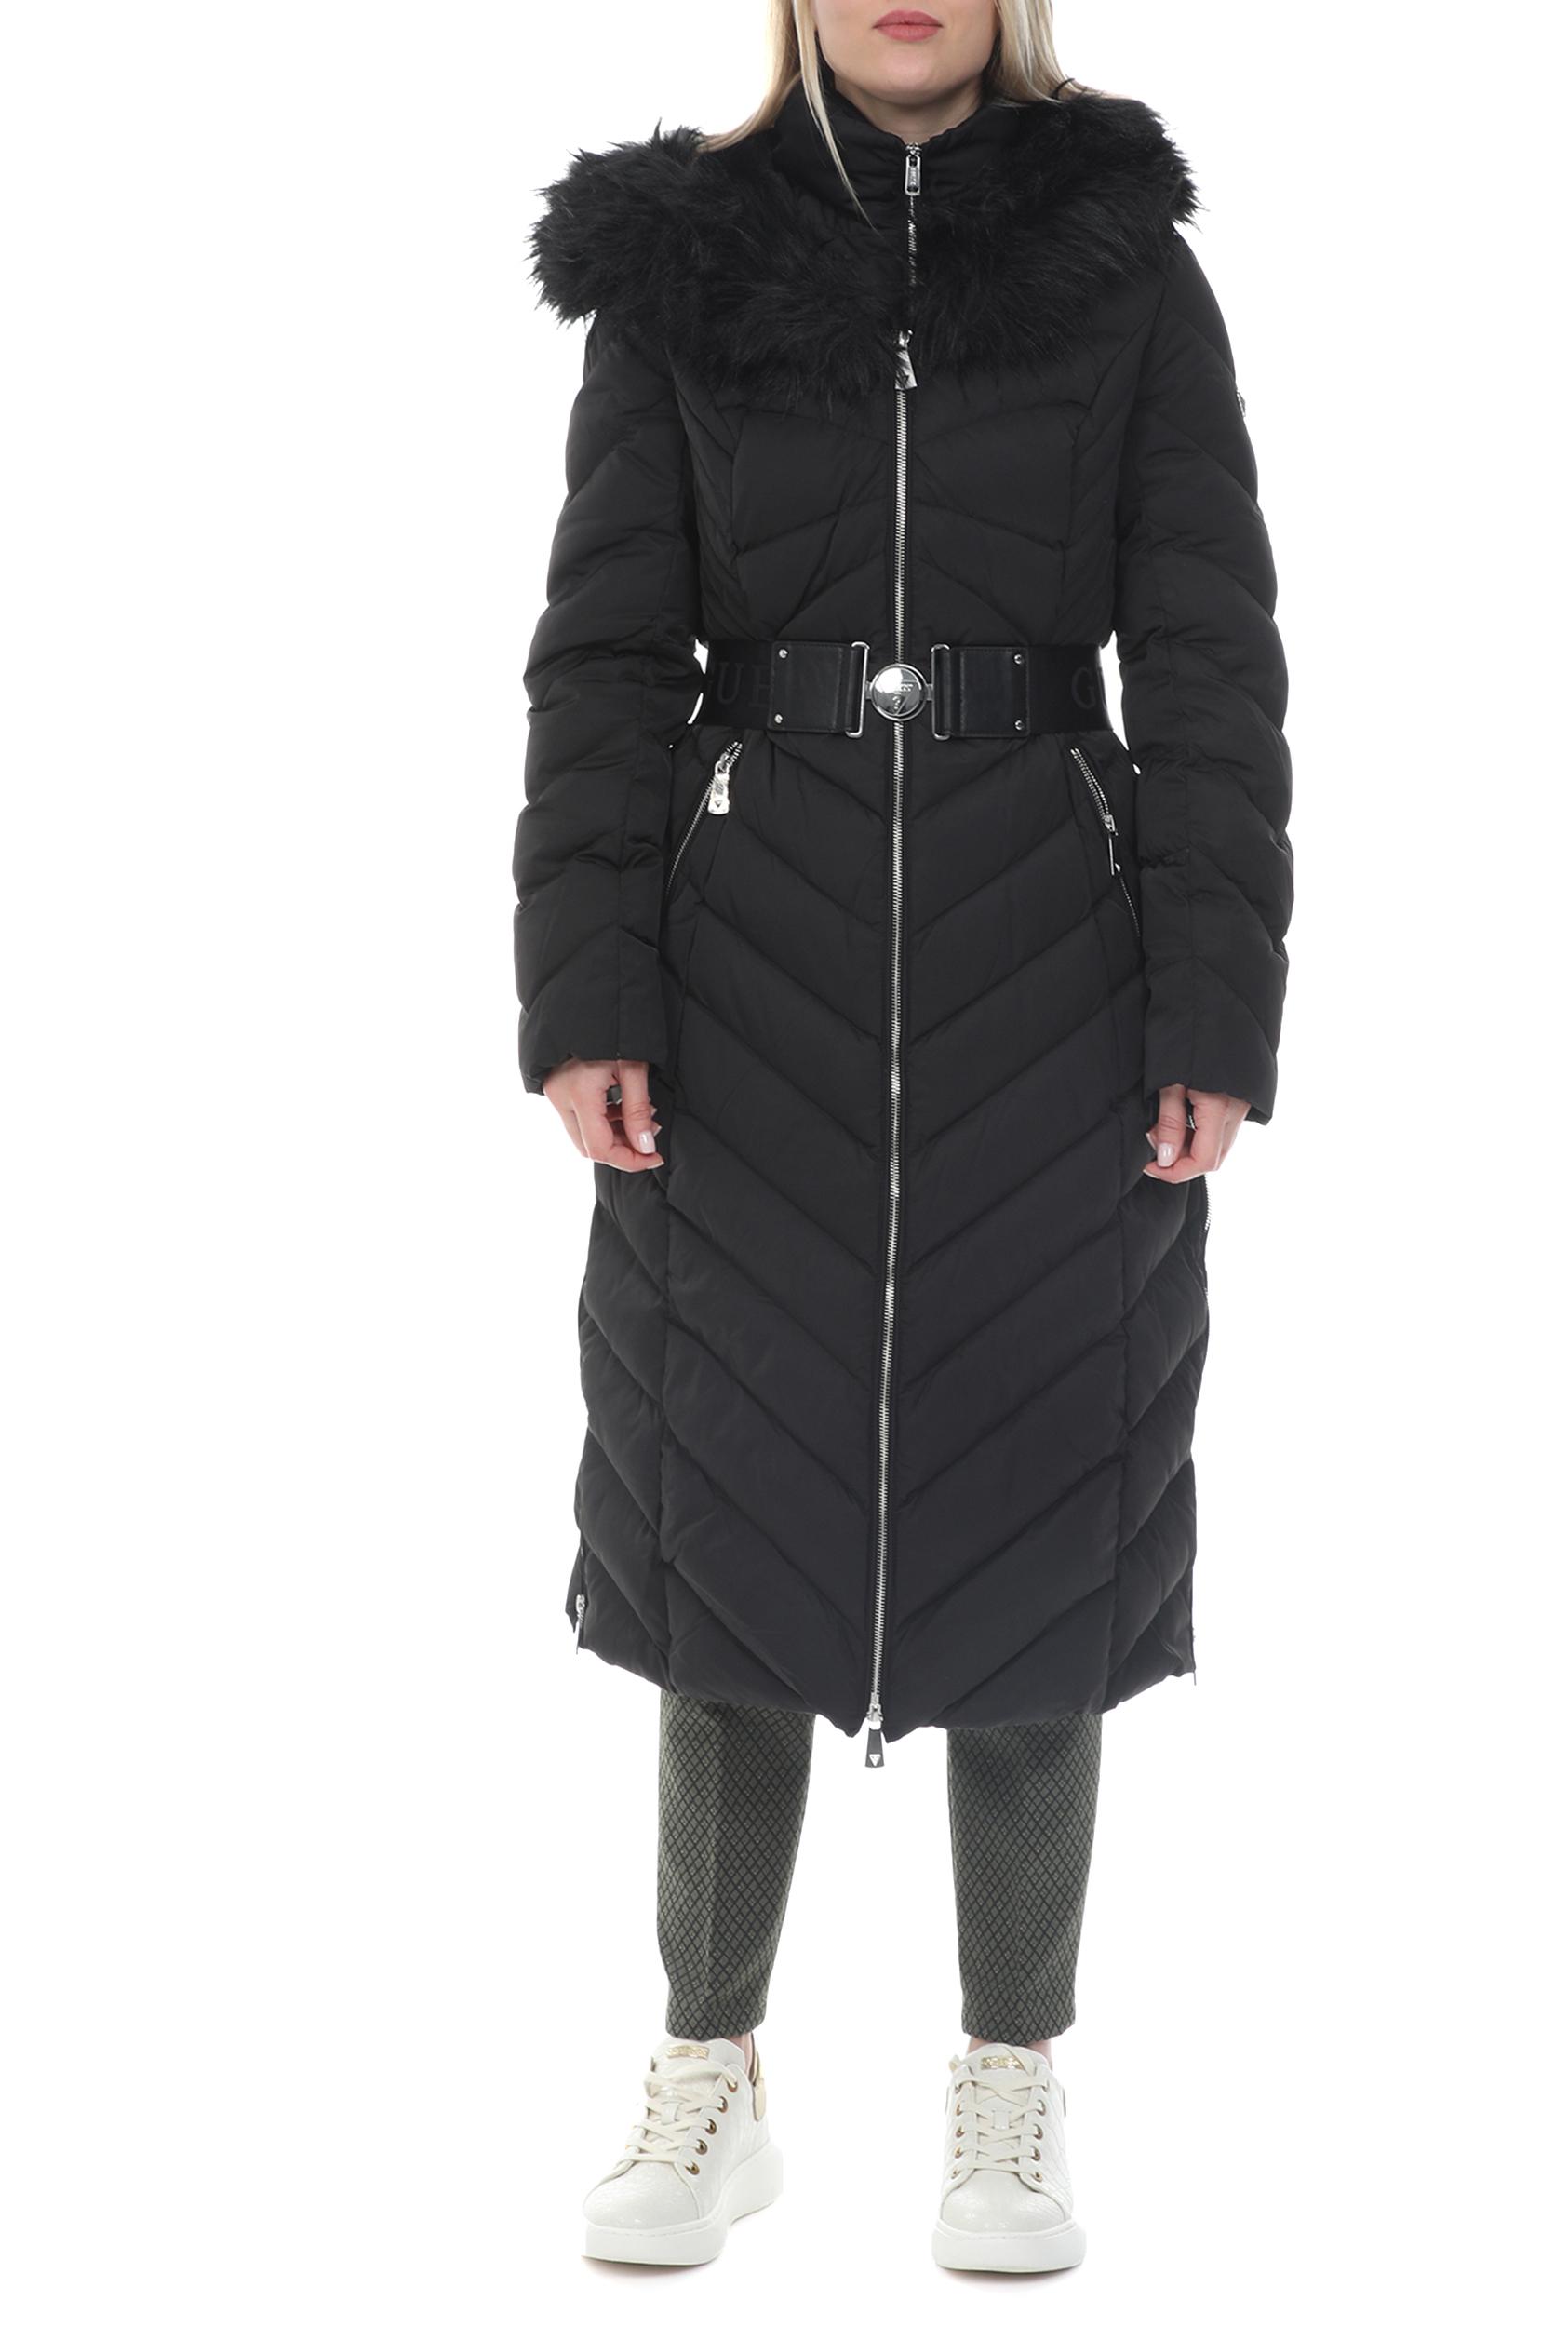 GUESS - Γυναικείο μακρύ padded μπουφάν GUESS SOFIA LONG DOWN JACK - TECH μαύρο